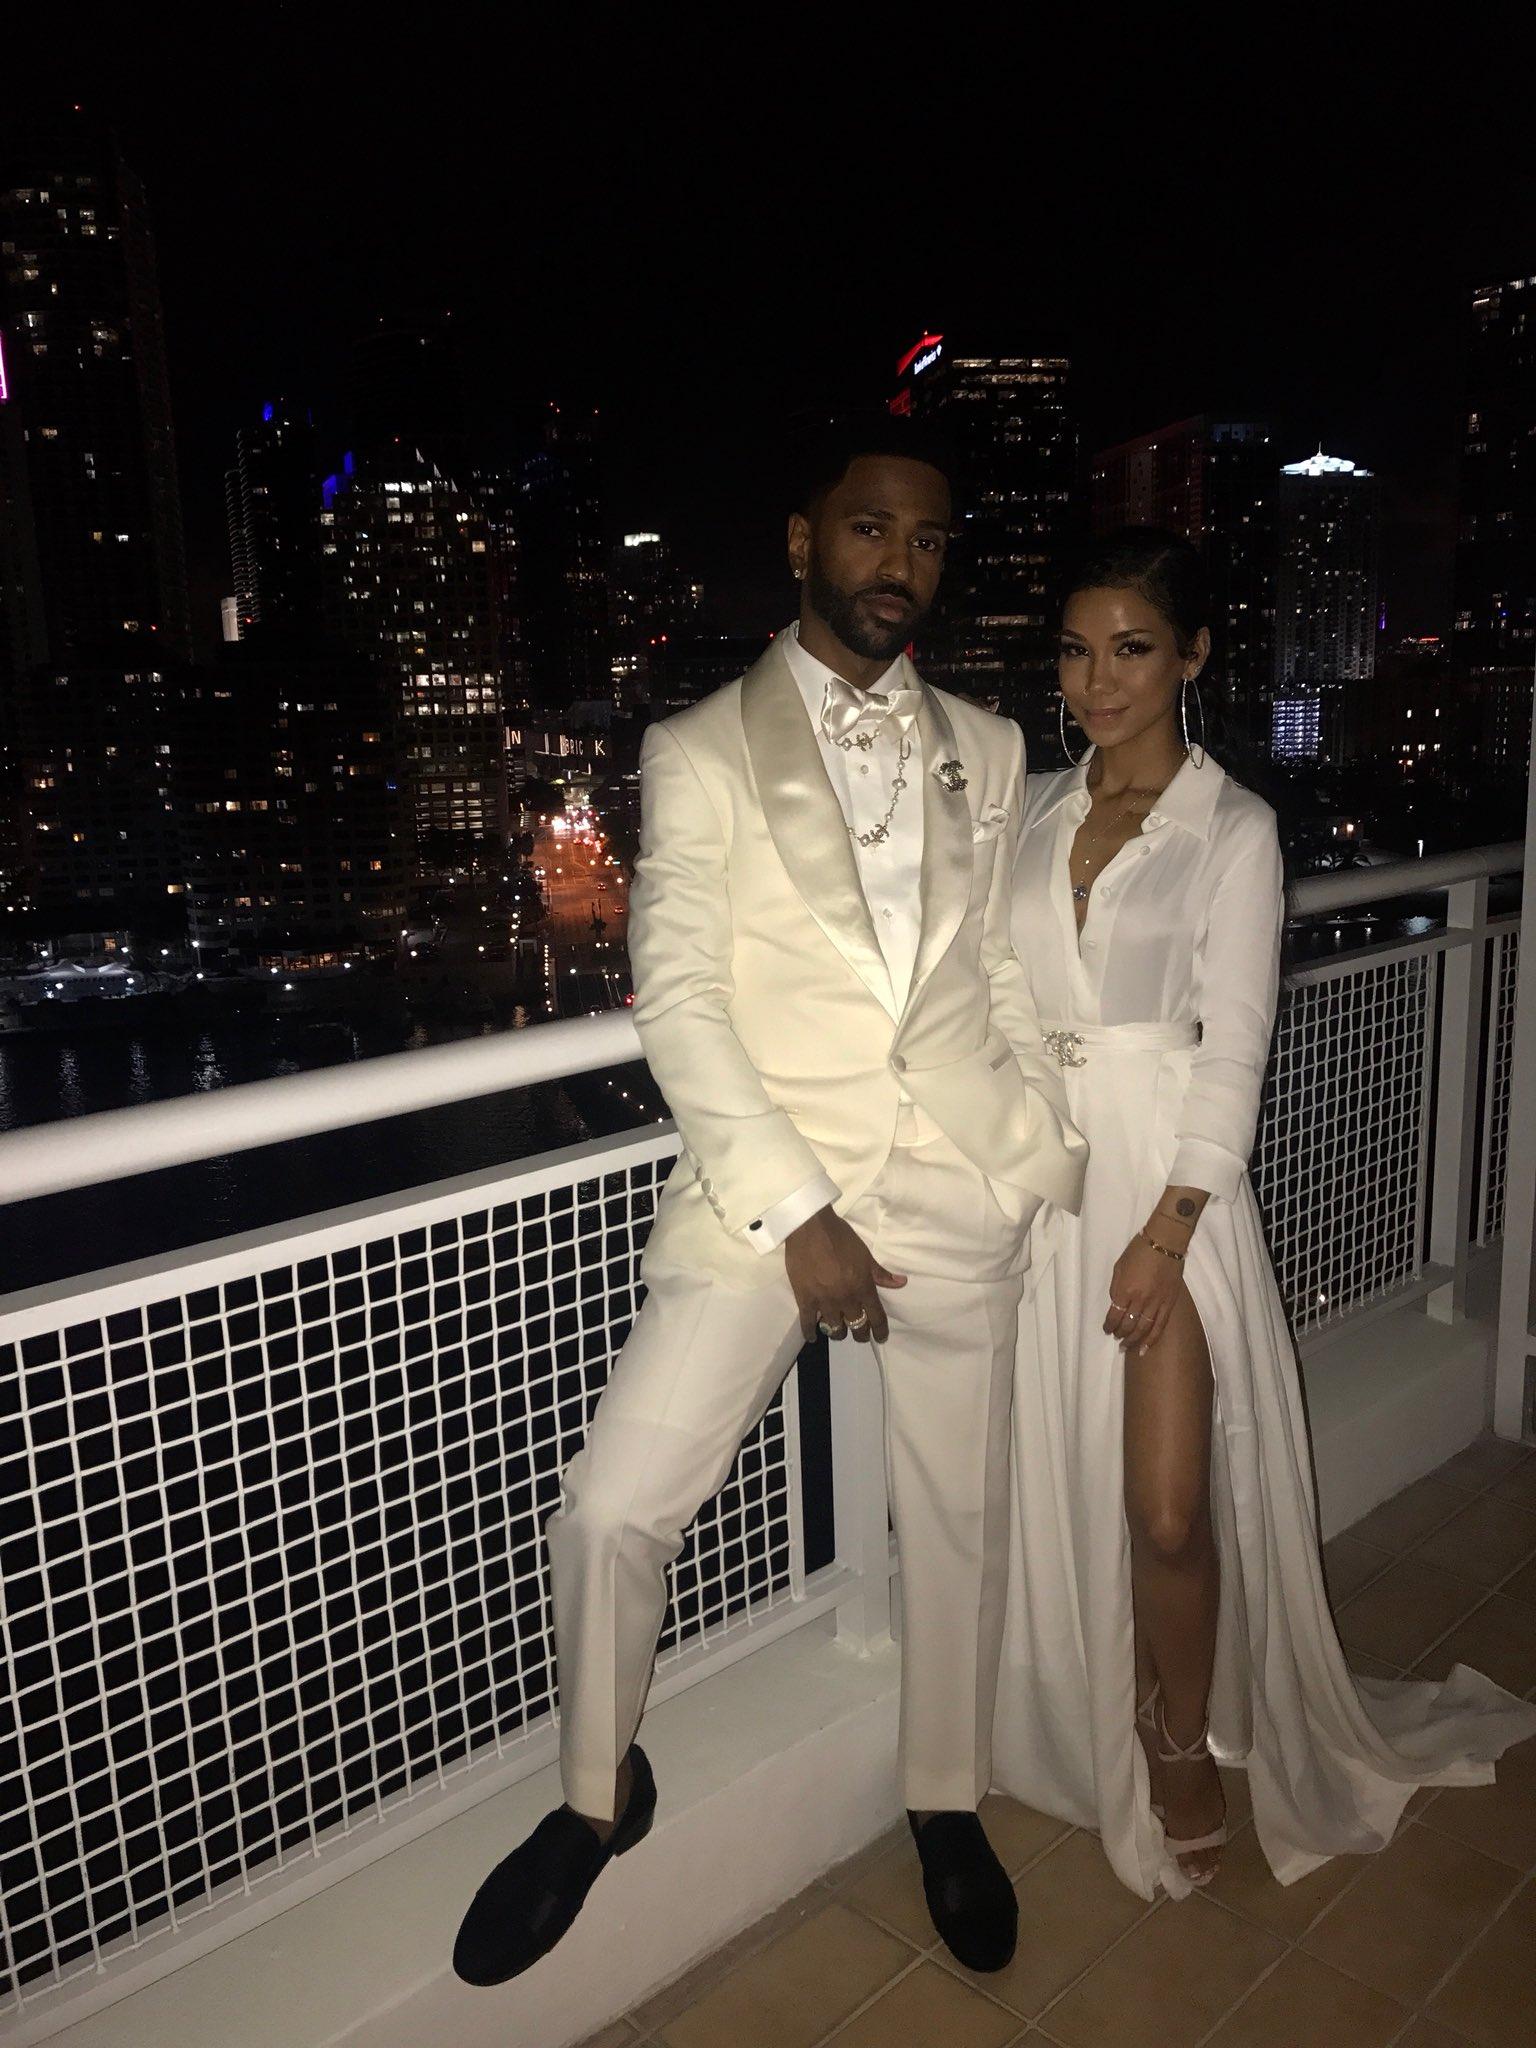 Made it down for Gucci n Keyshia wedding. https://t.co/HhjoOW5DYC